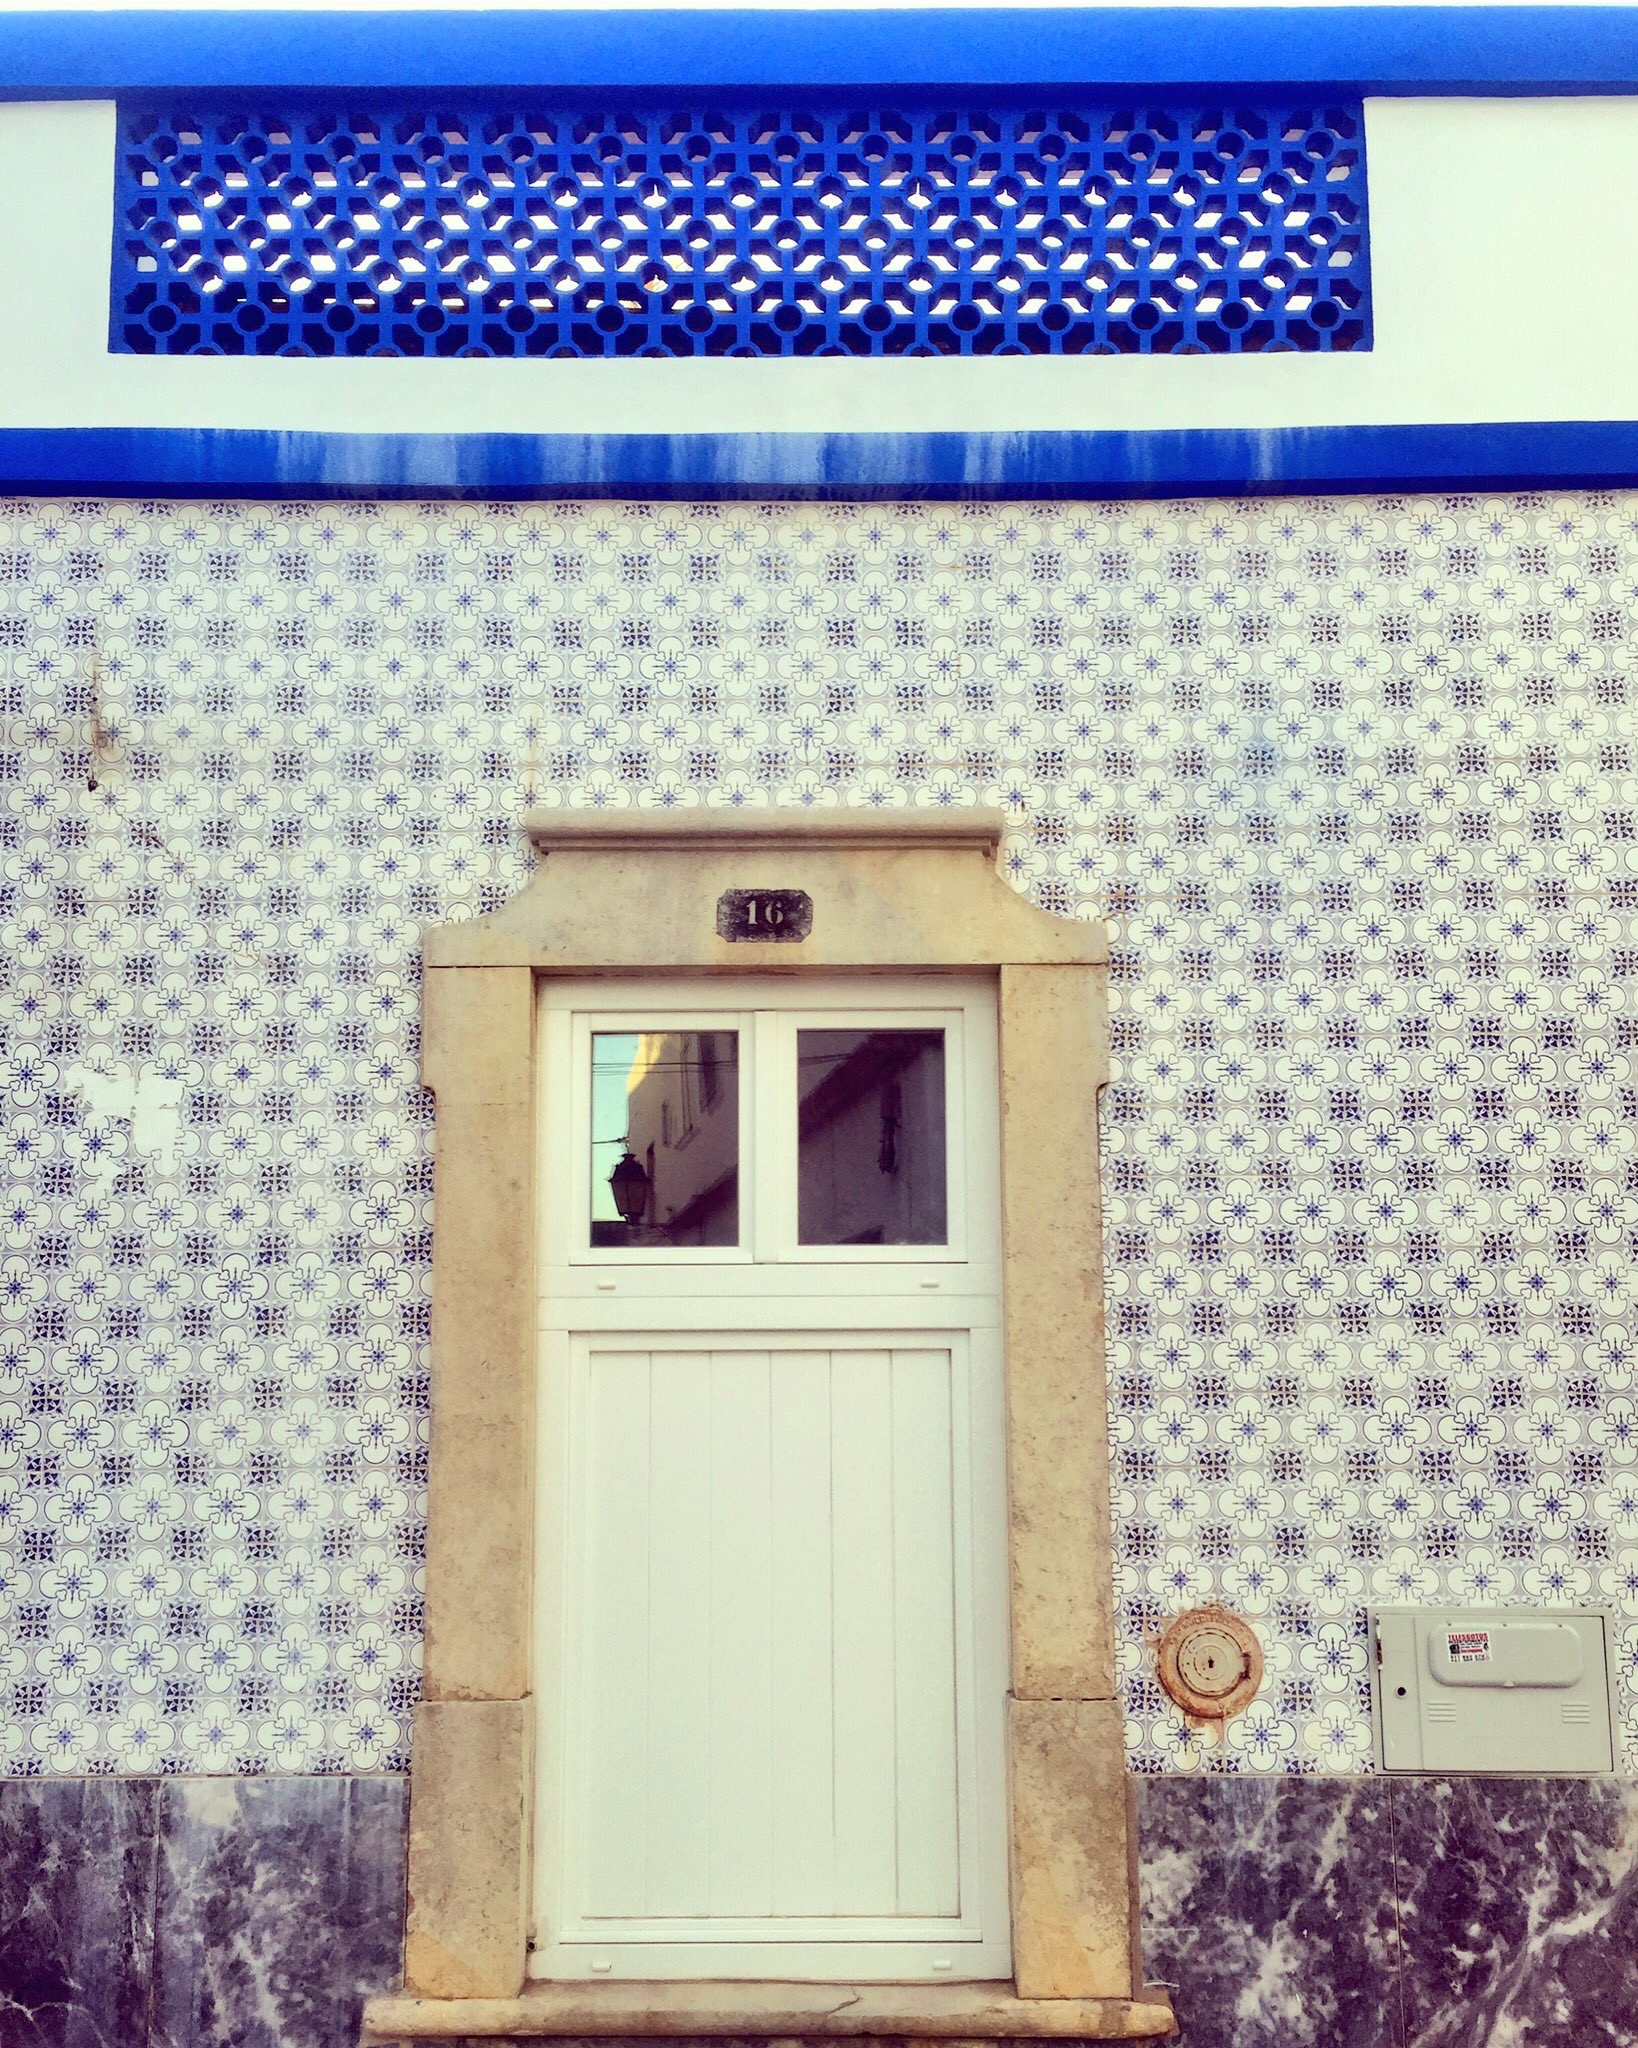 KARENMICHELLE- ARCHITECTURE - PORTUGAL 16'